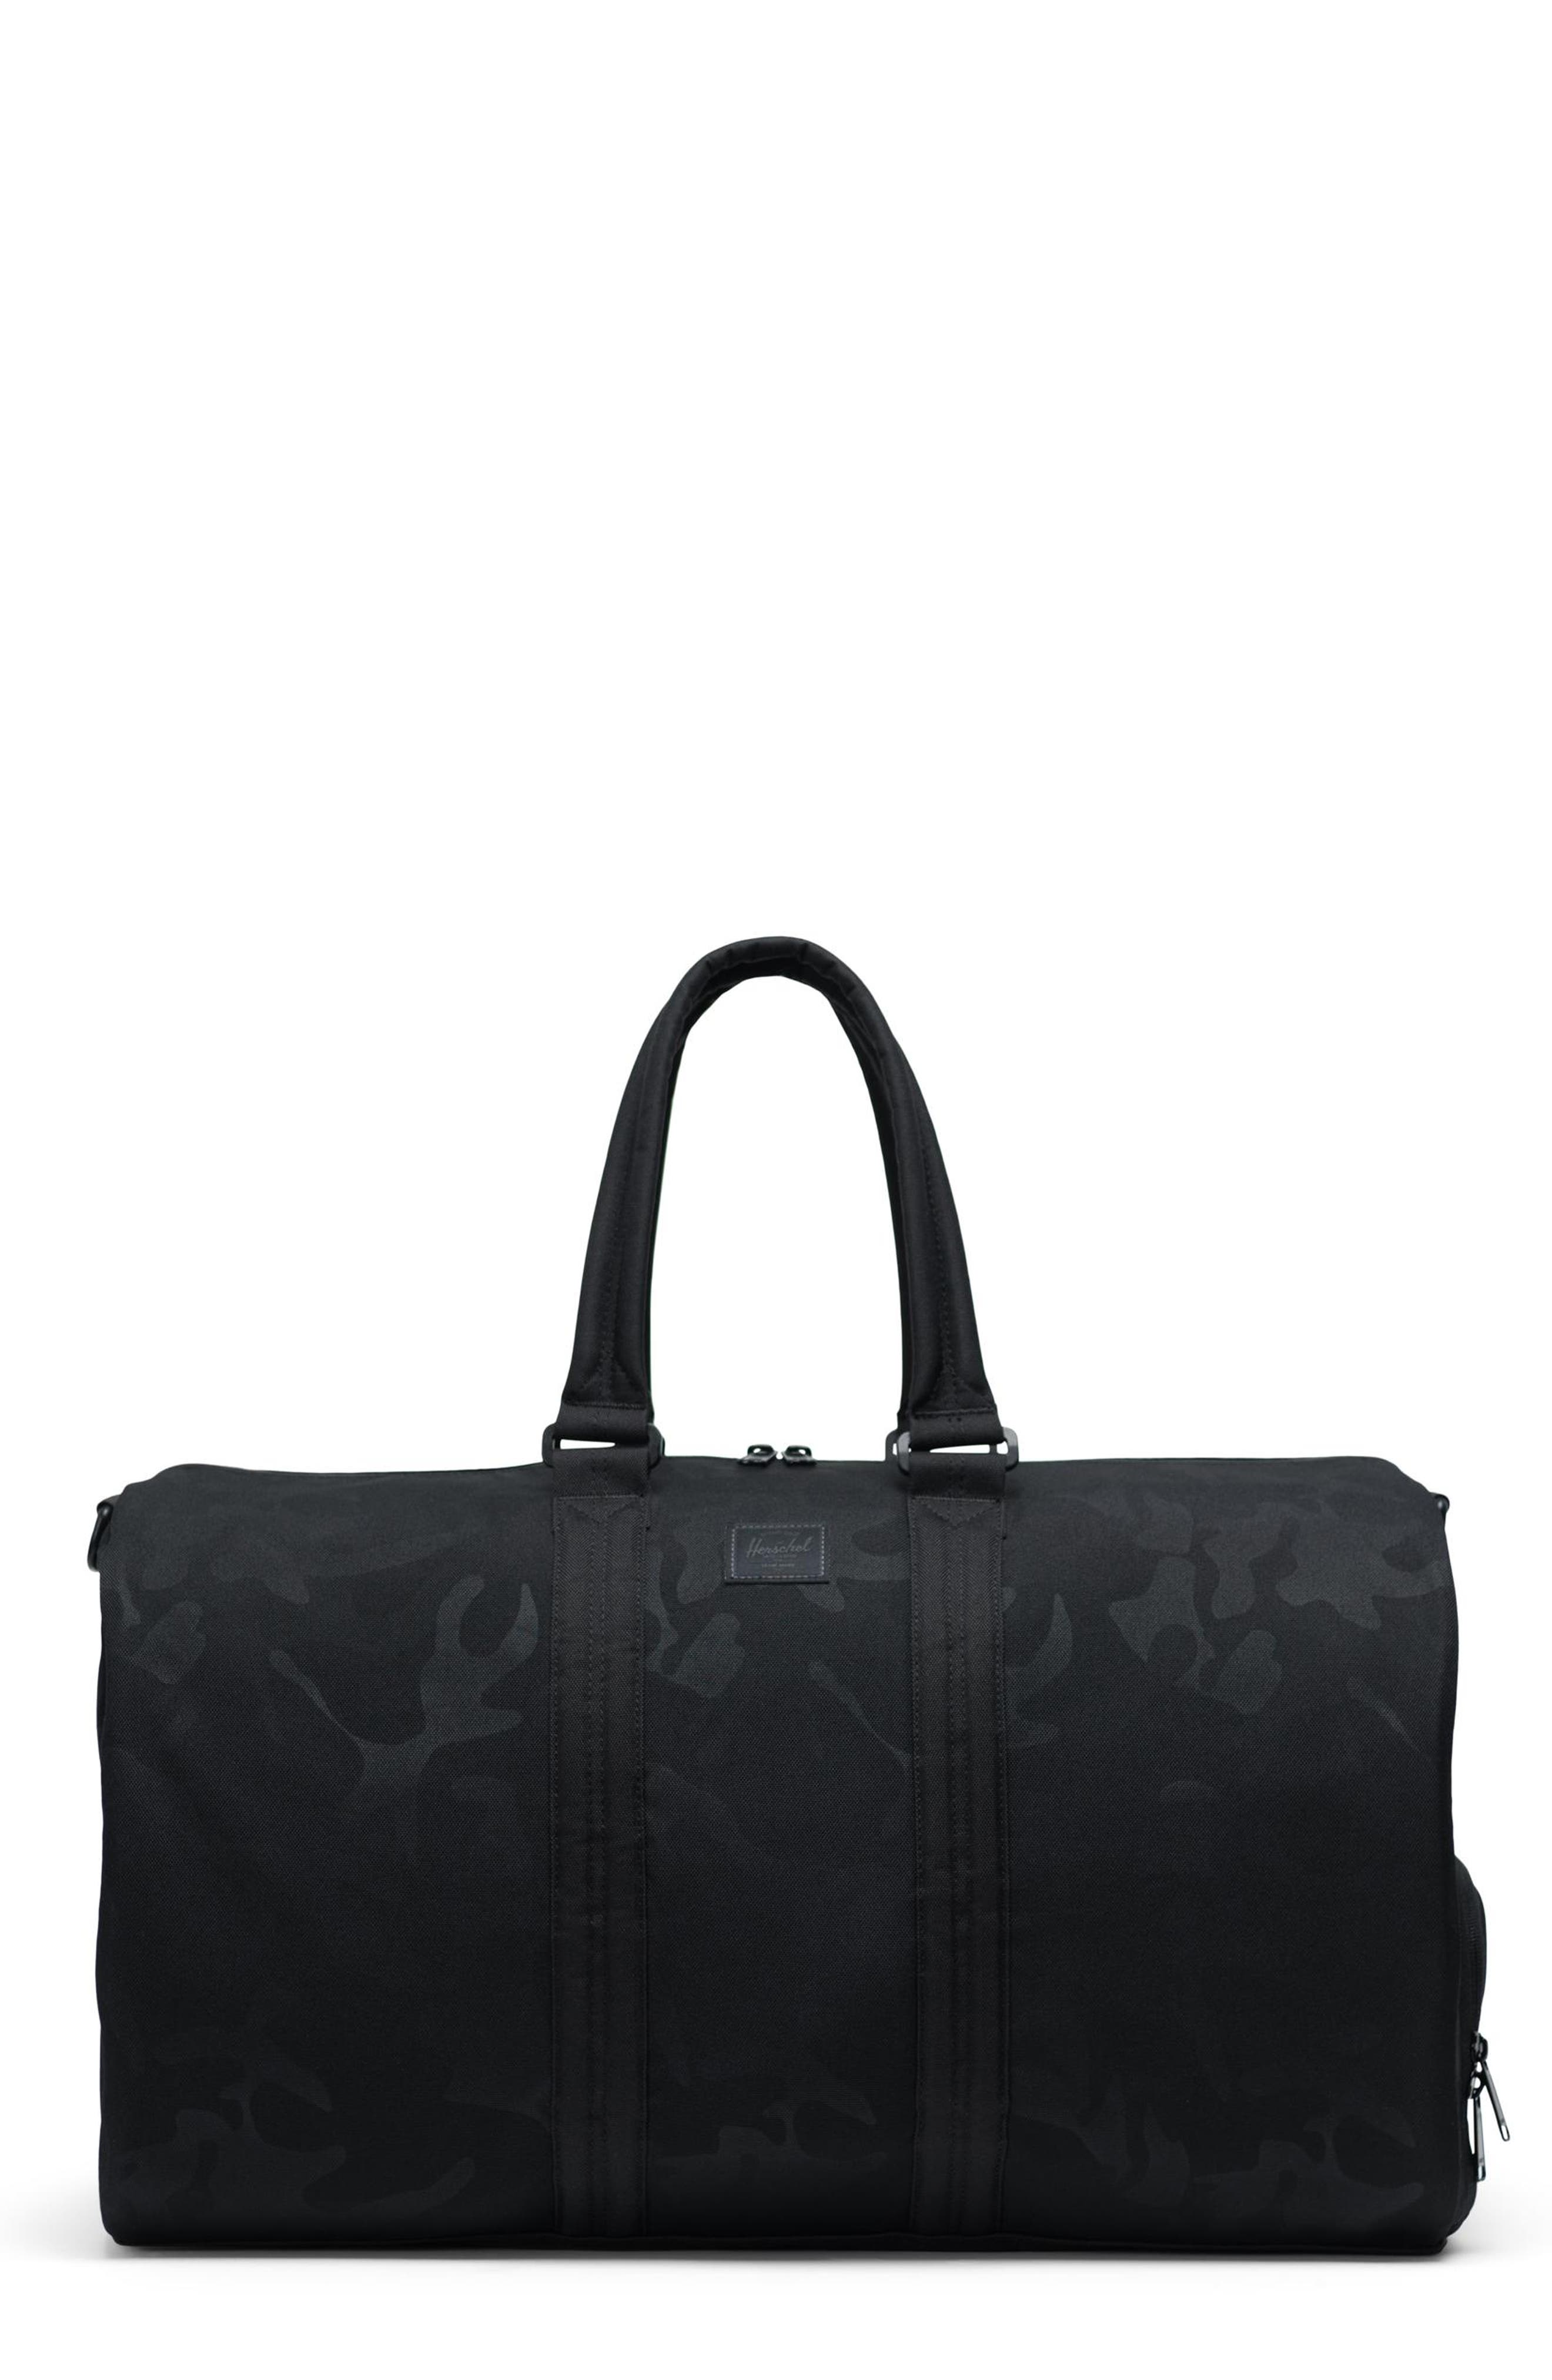 HERSCHEL SUPPLY CO., Duffle Bag, Main thumbnail 1, color, BLACK/ TONAL CAMO